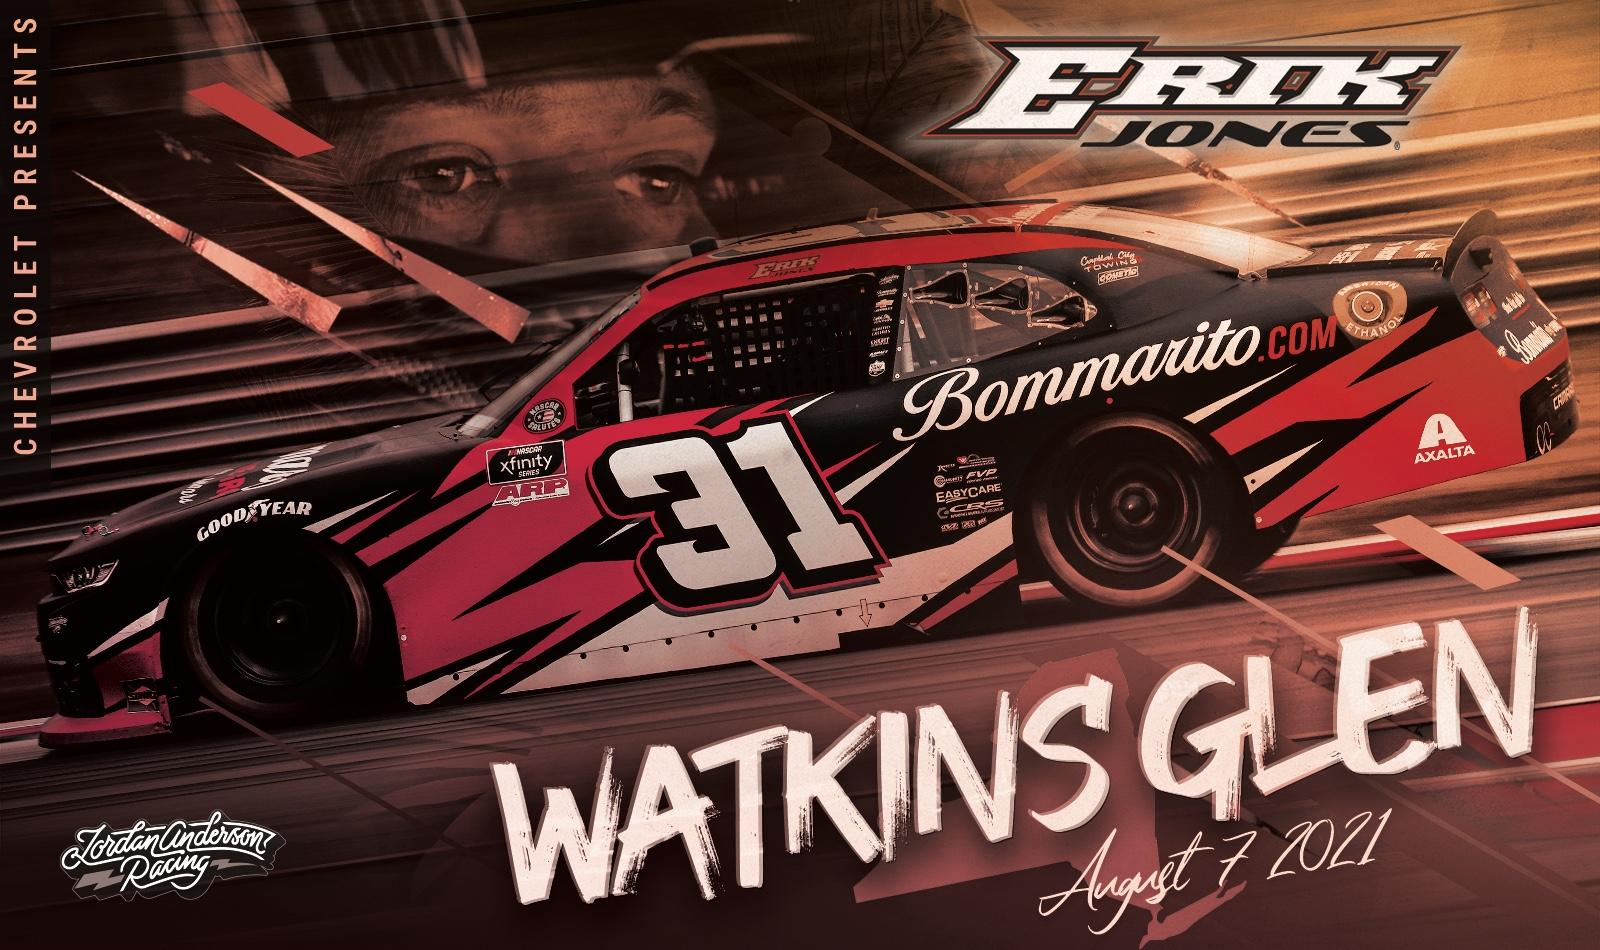 Erik Jones Returns to the Xfinity Series Driving for Jordan Anderson Racing at Watkins Glen